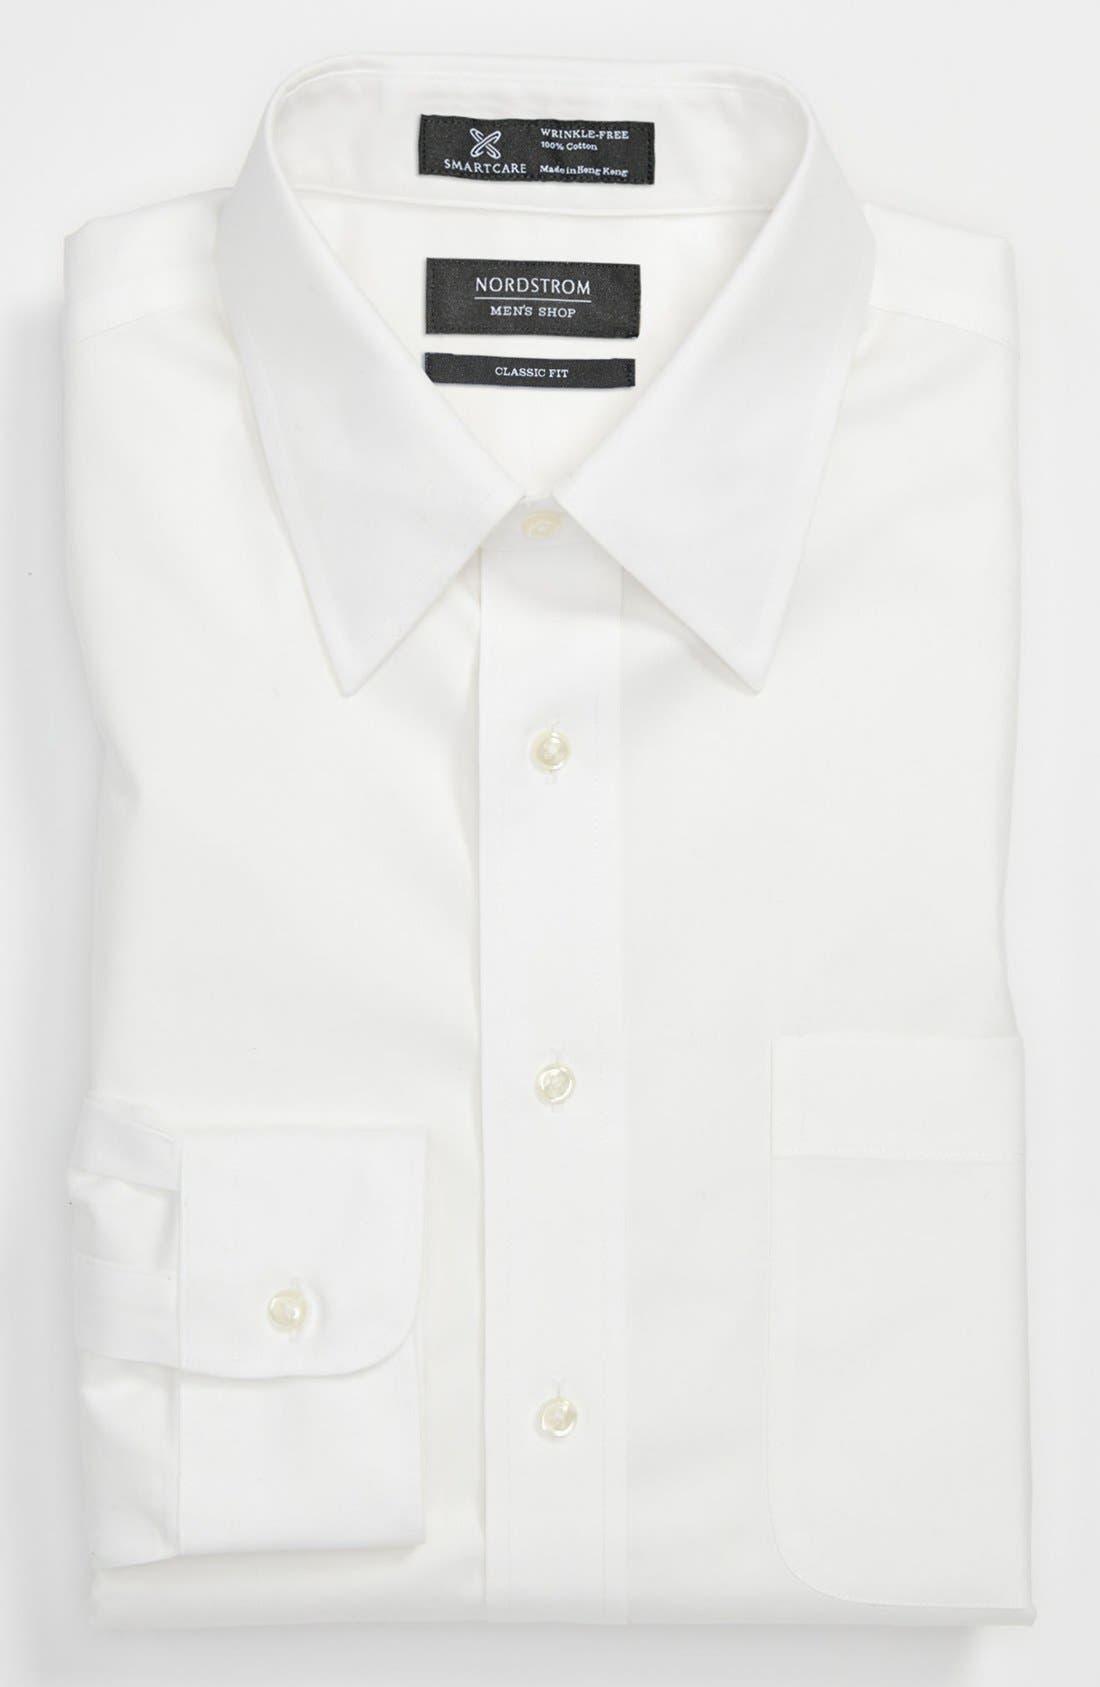 Nordstrom Men's Shop Smartcare™ Classic Fit Solid Dress Shirt (Online Only)